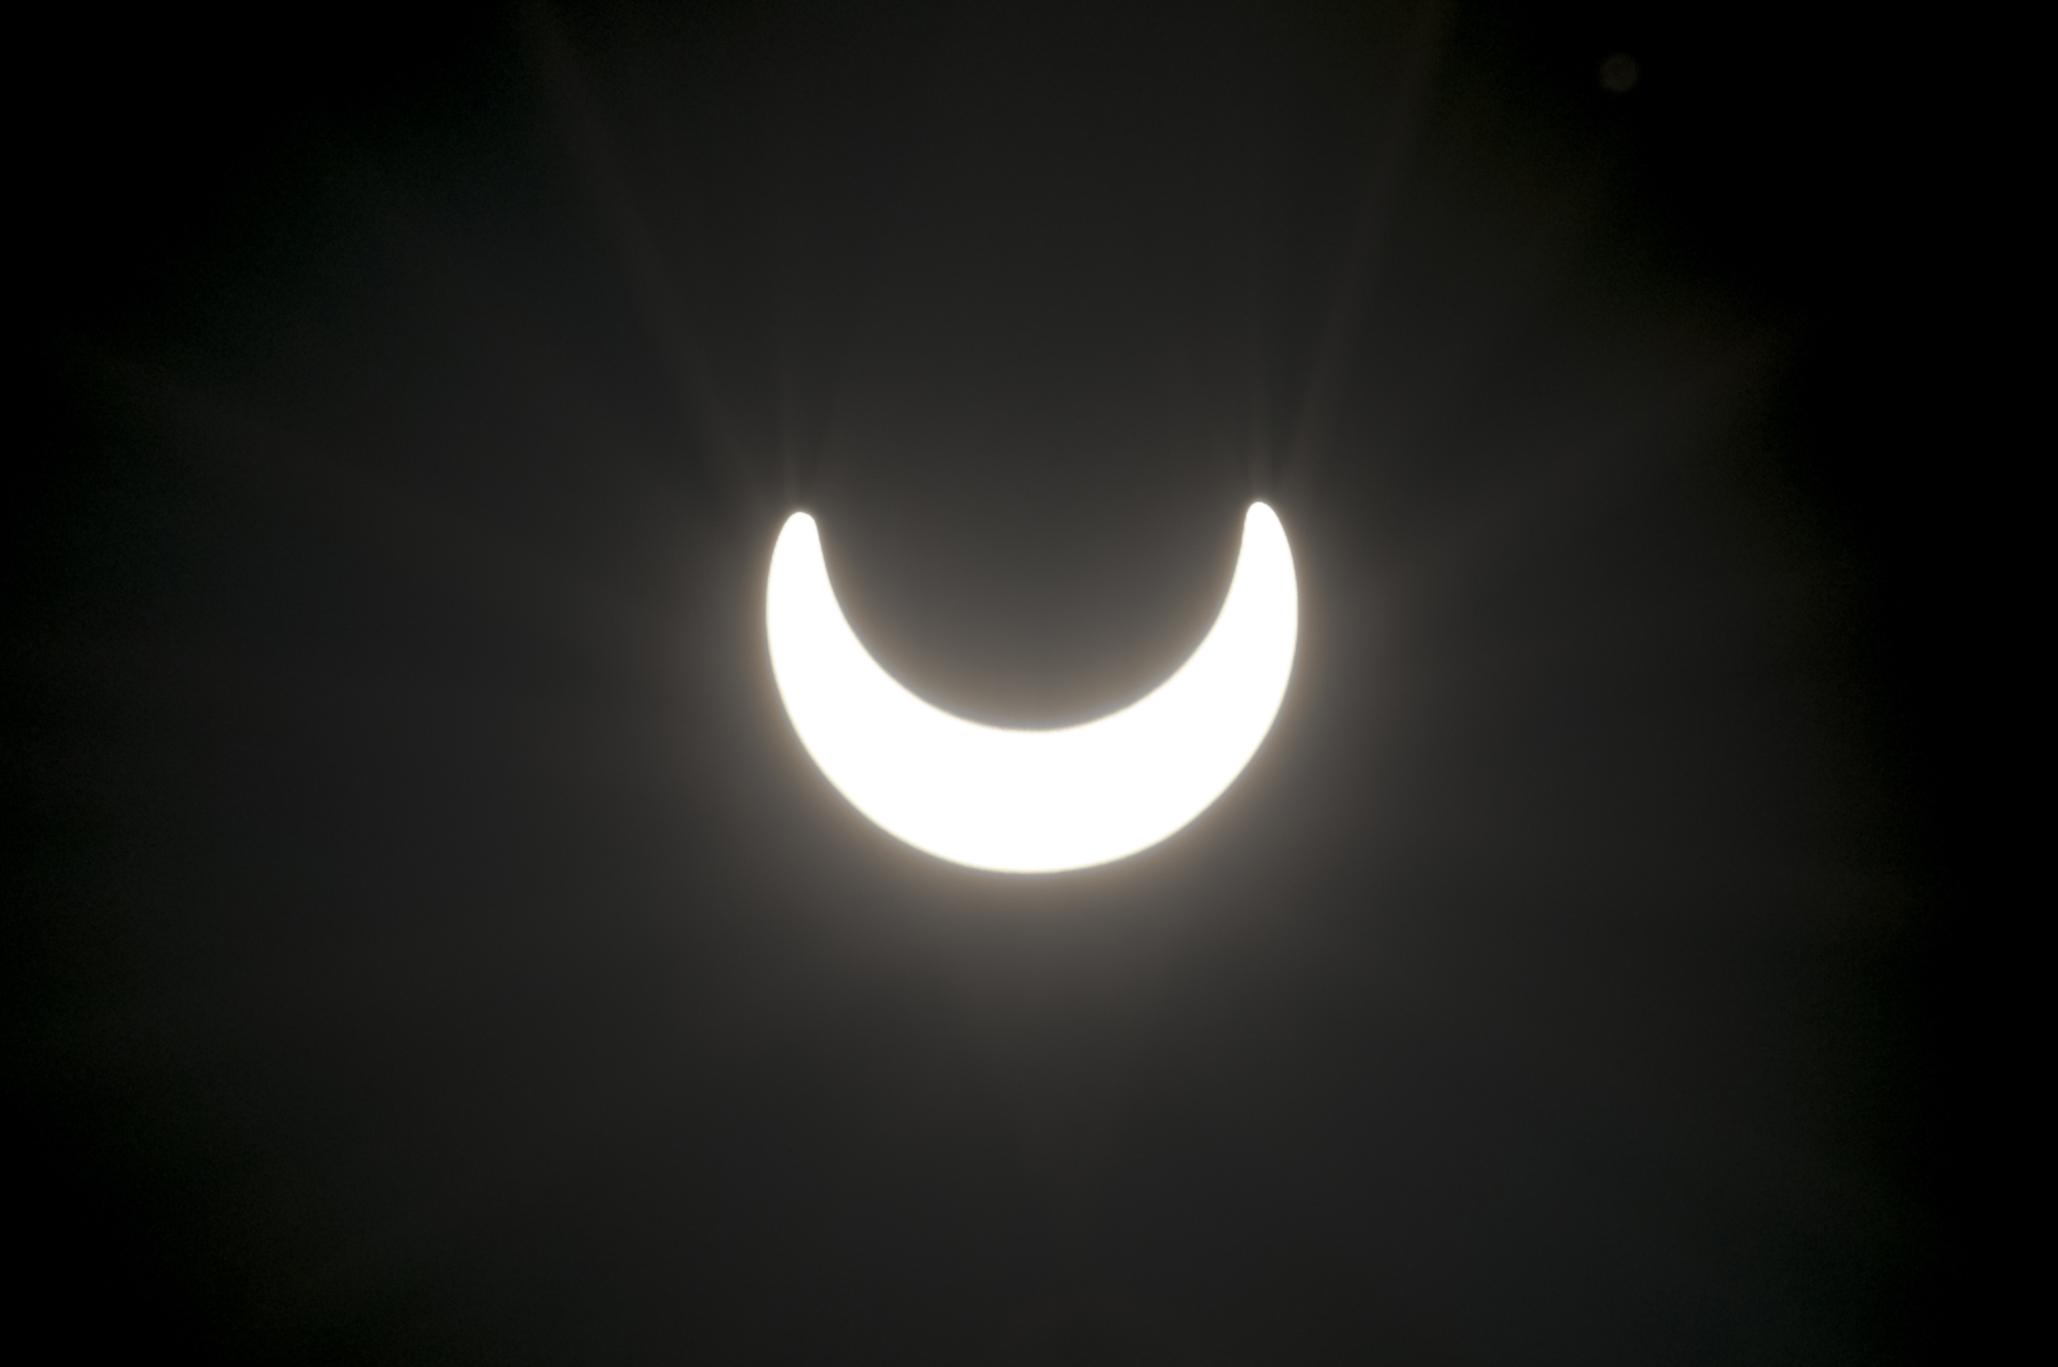 Autor: Ninjiangstar (Praca własna) [CC BY-SA 3.0 (http://creativecommons.org/licenses/by-sa/3.0)], Wikimedia Commons